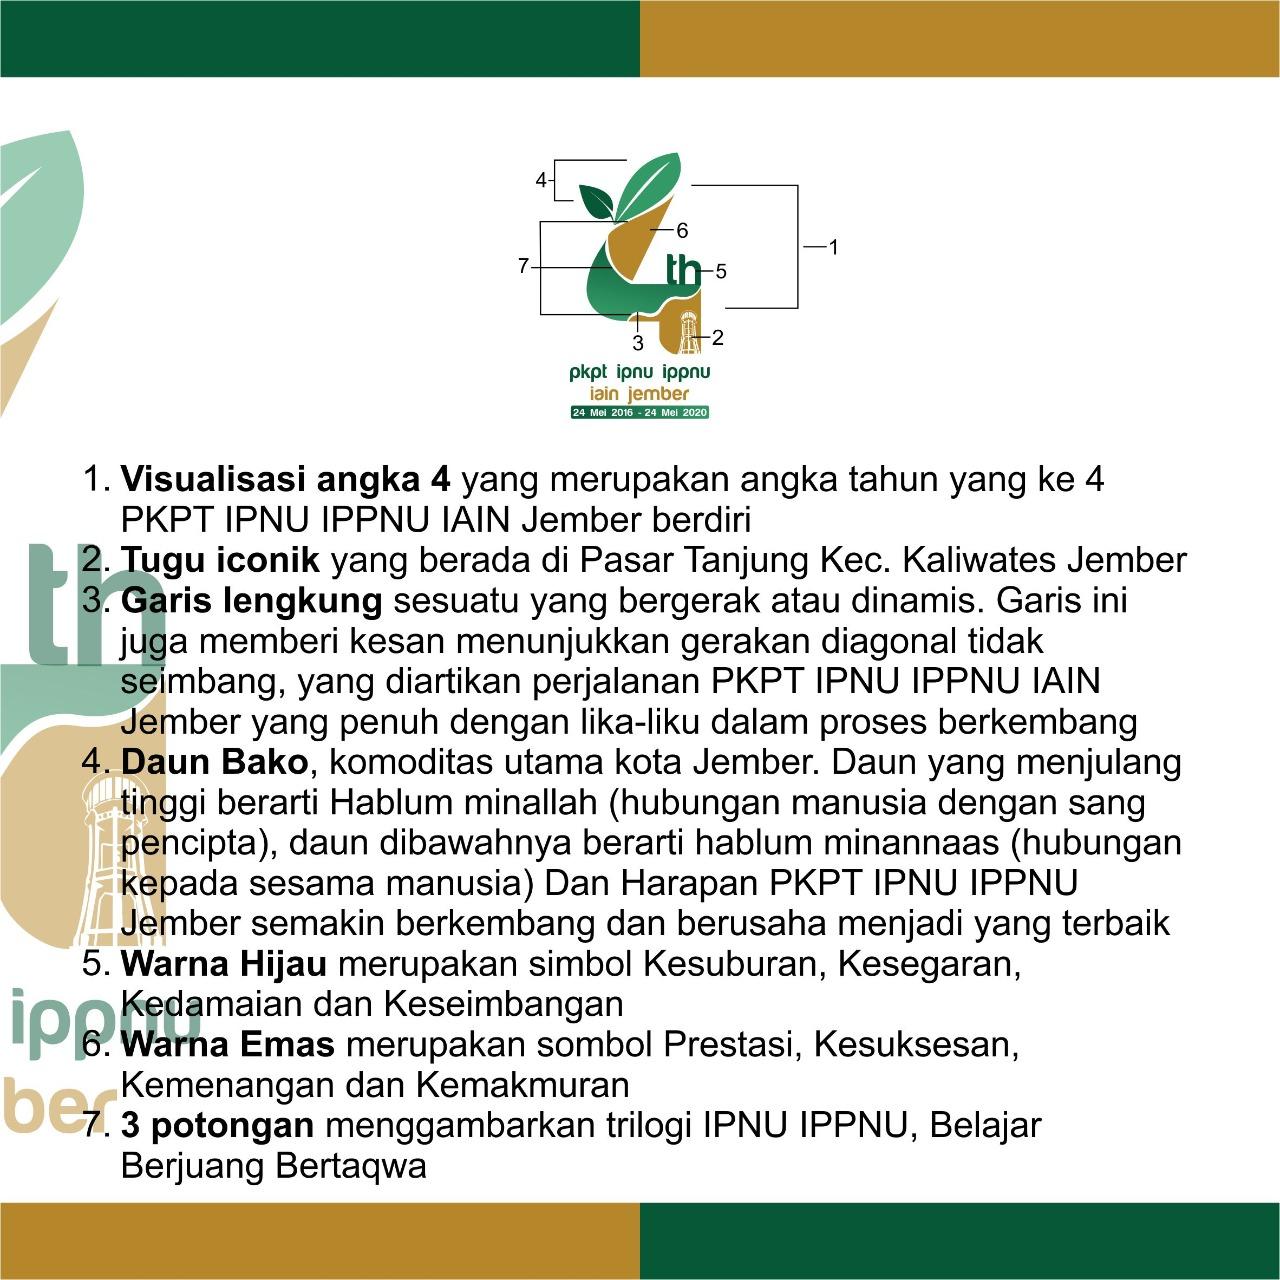 Filosofi Logo Harlah PKPT IPNU IPPNU IAIN Jember ke 4